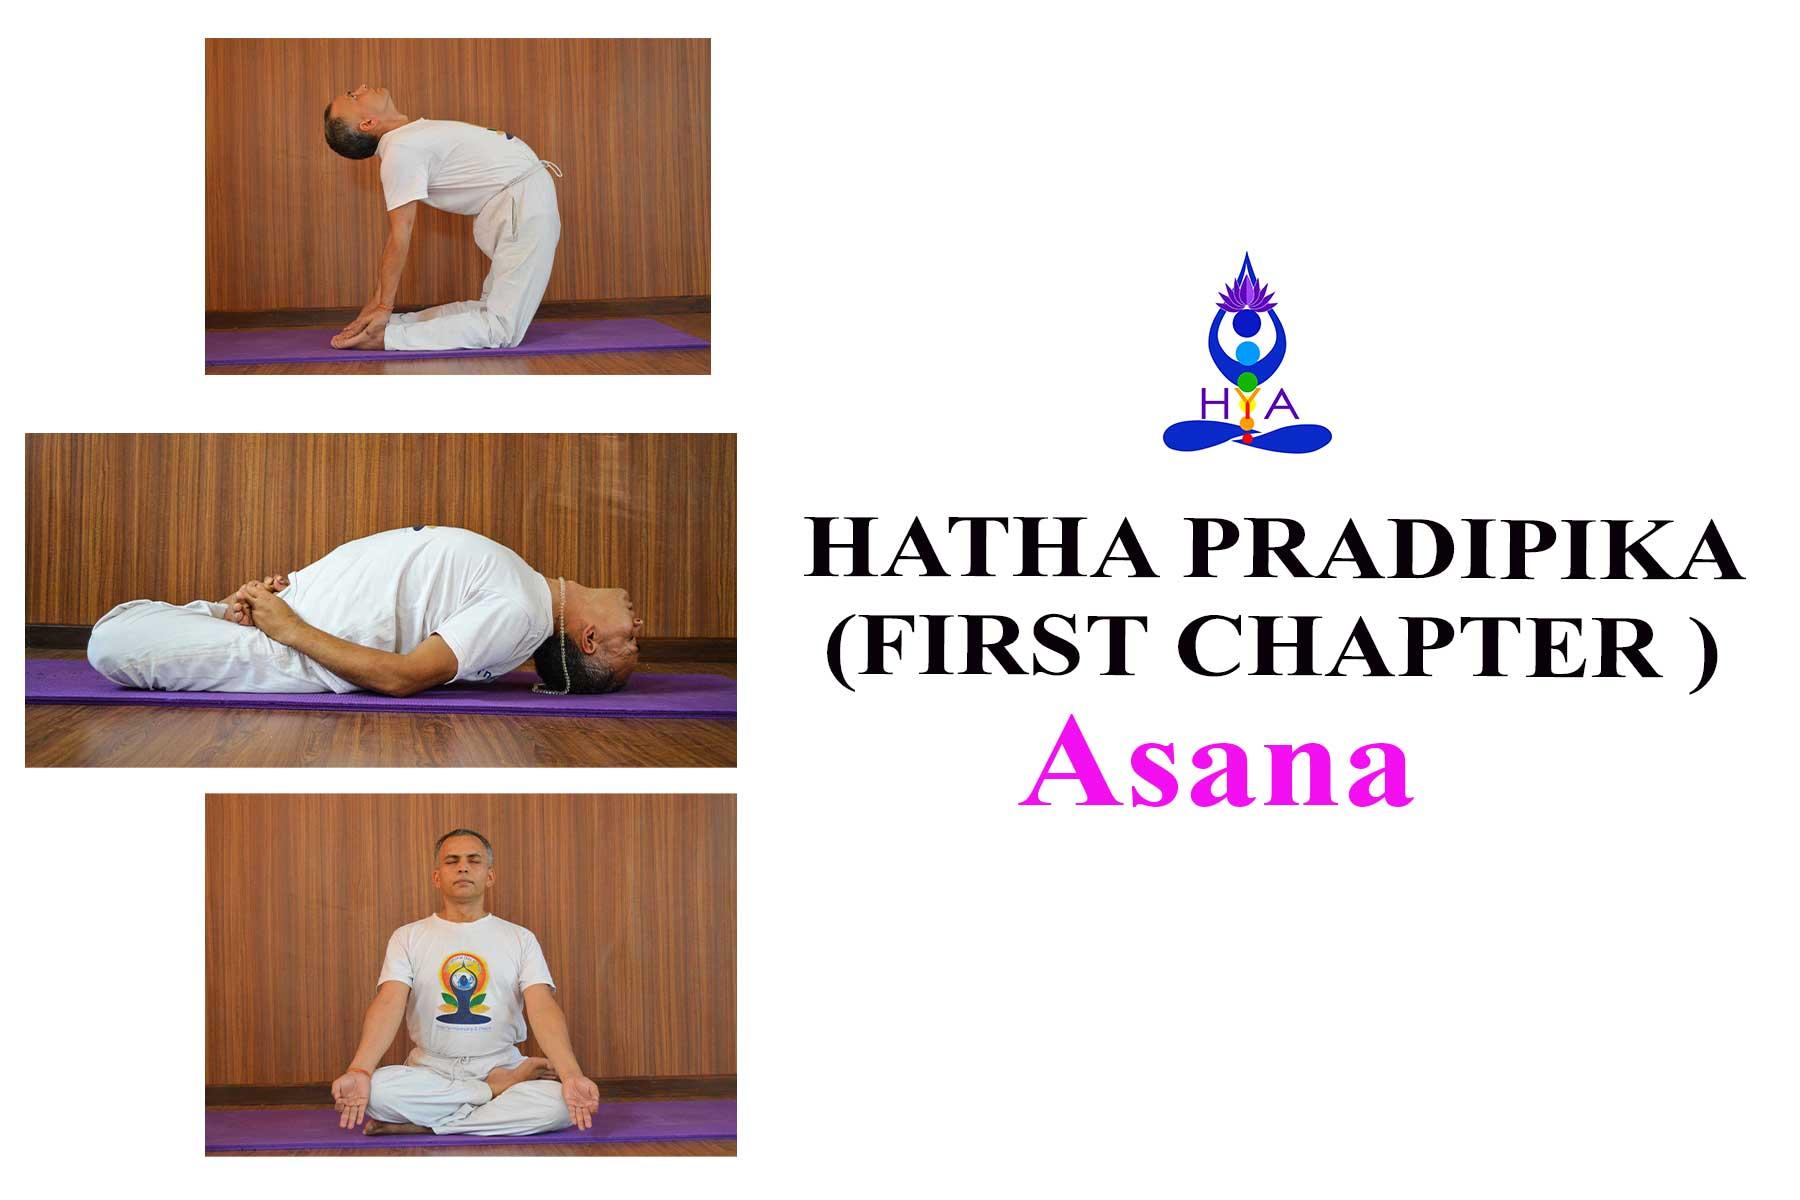 asana-first-chapter